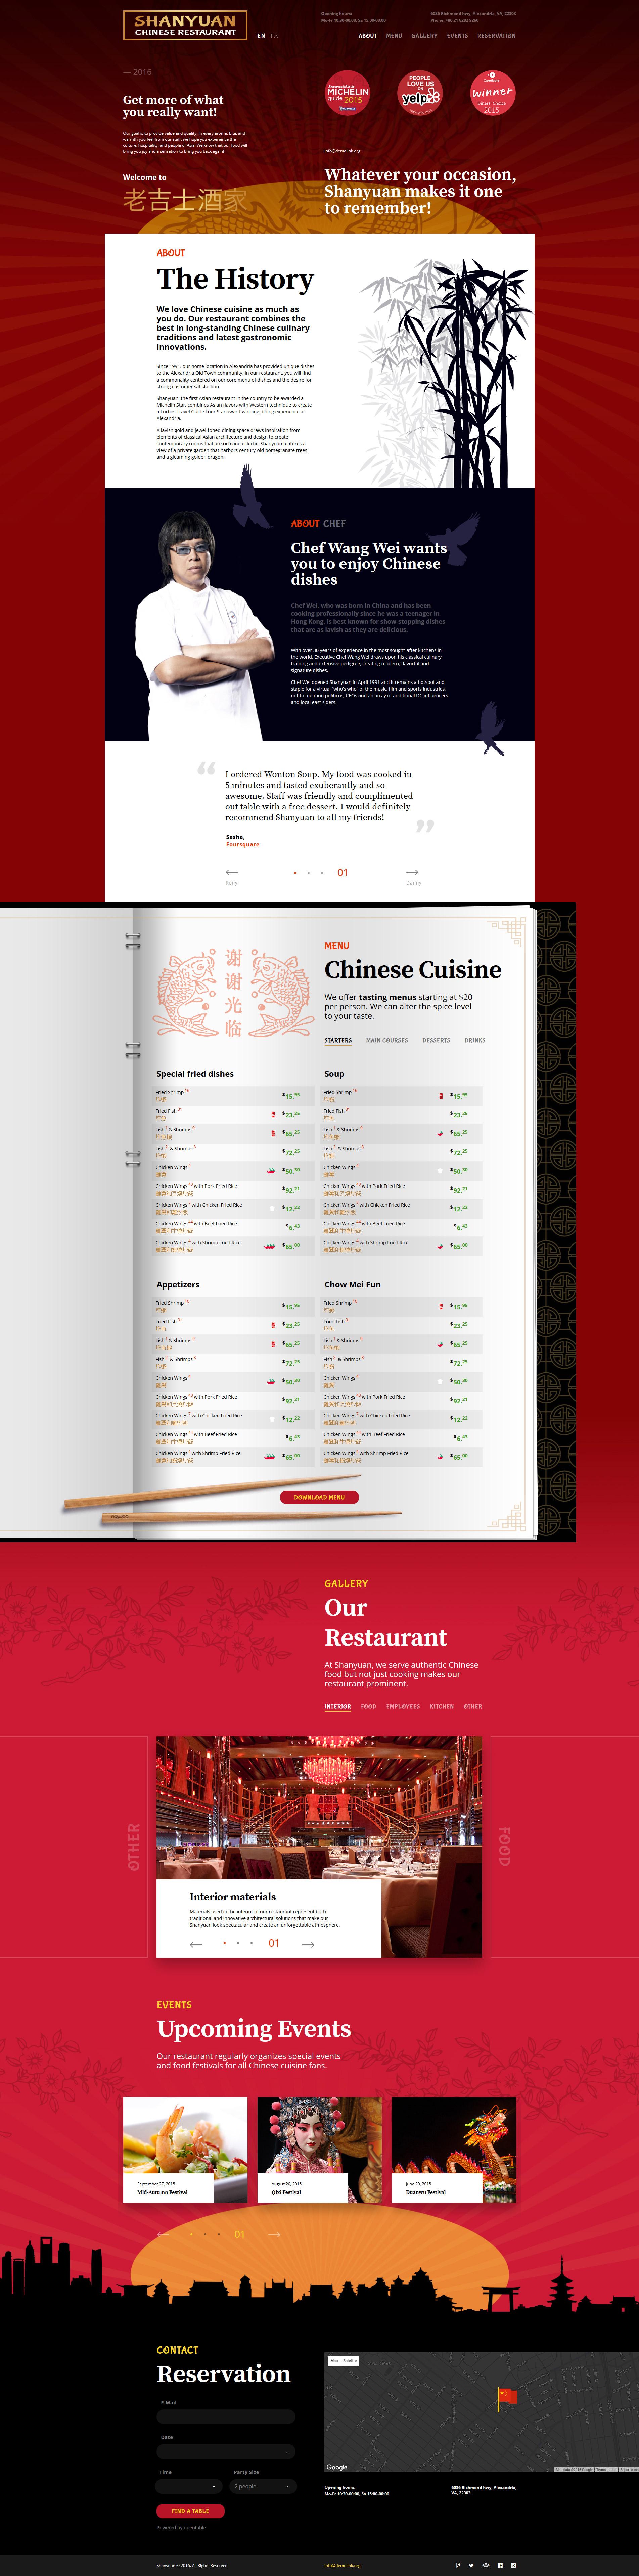 Plantilla Web Responsive para Sitio de Restaurantes chinos #58239 - captura de pantalla